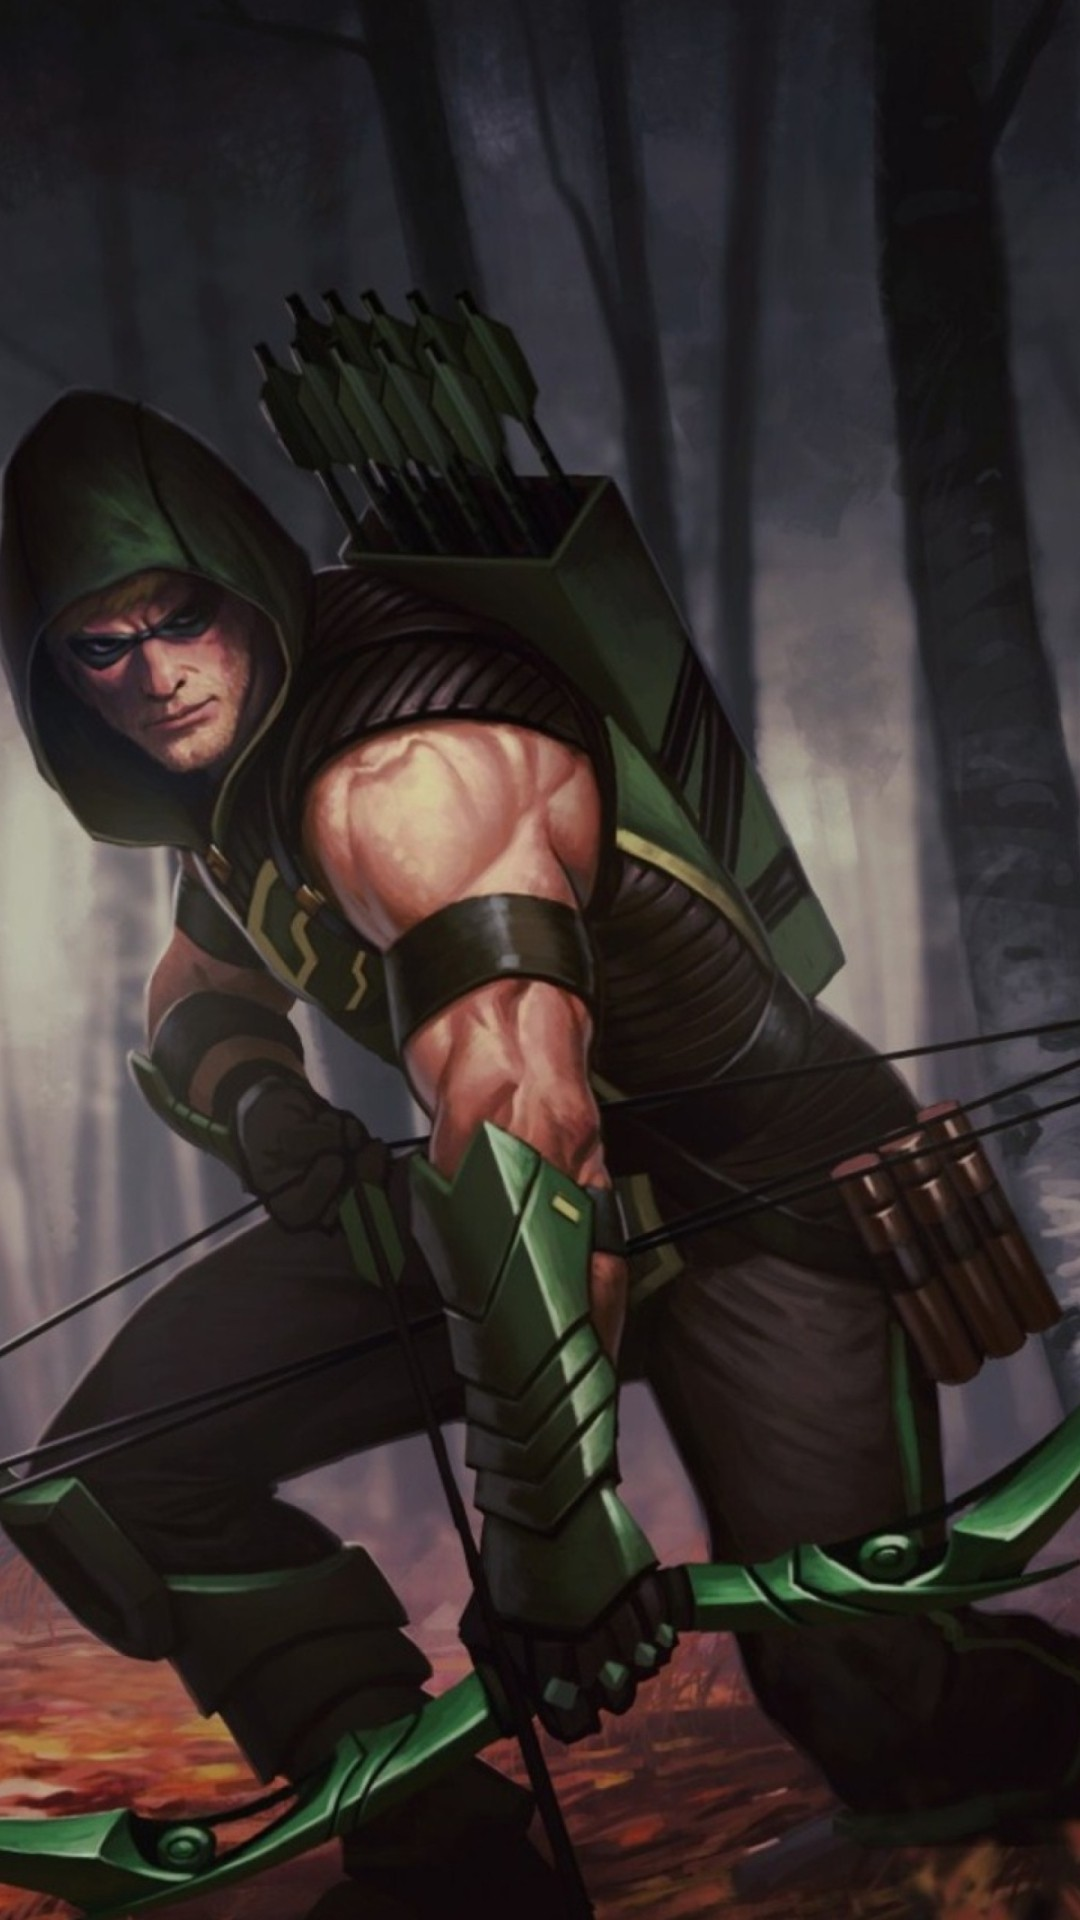 Green Arrow wallpaper for iPhone